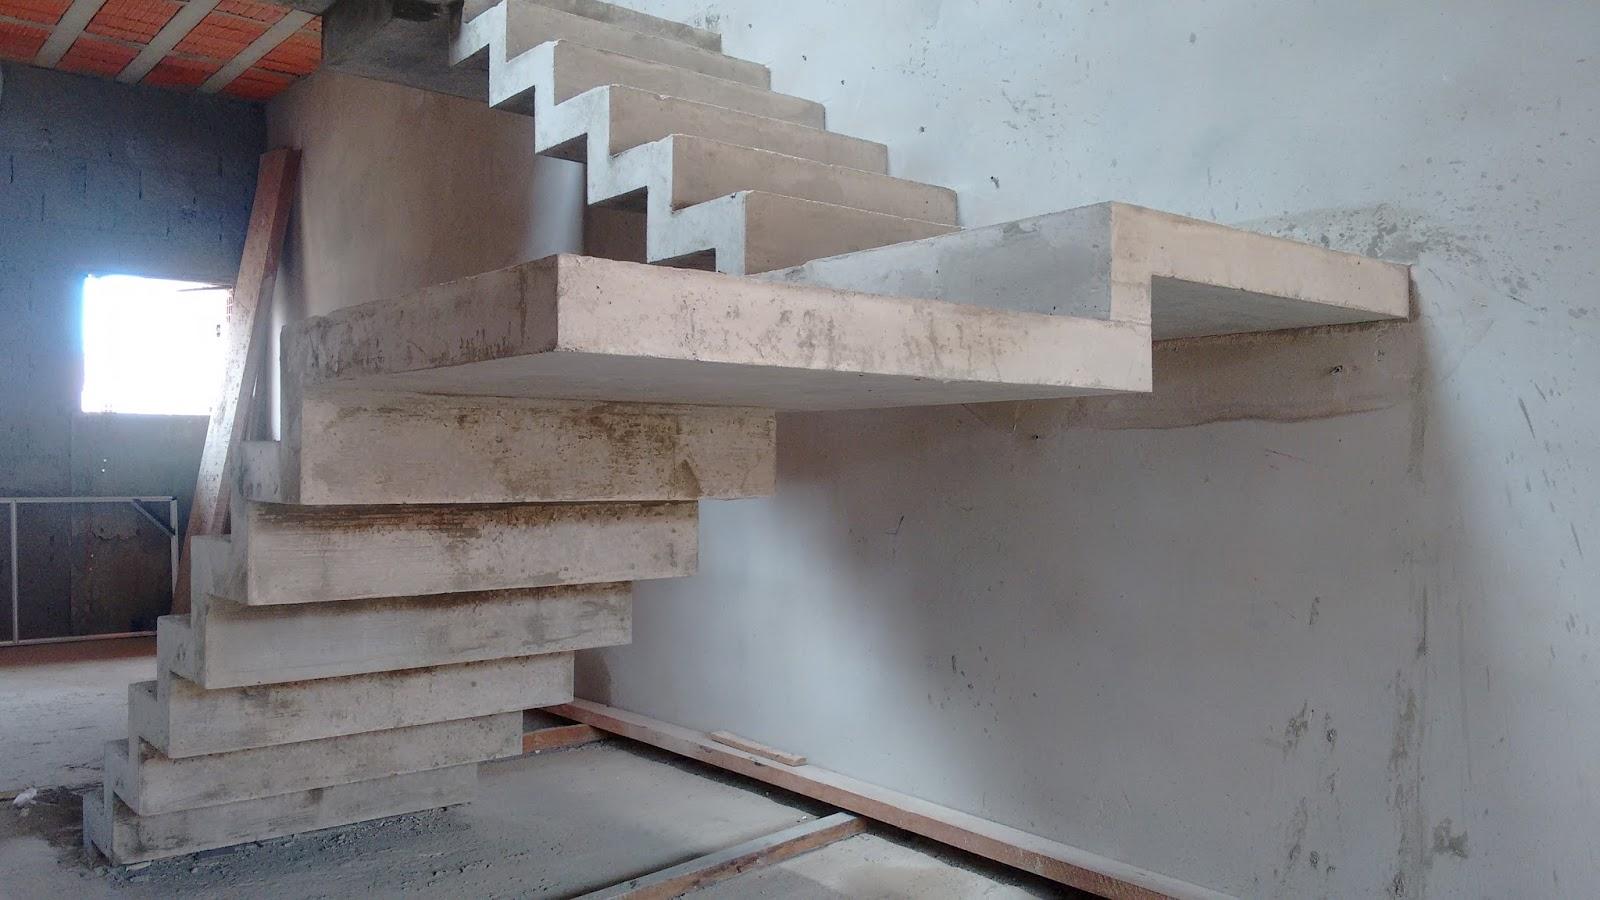 banco de concreto para jardim em jundiai : banco de concreto para jardim em jundiai: de Pinheiros, Alto de Pinheiros, Jardim Paulista, Itaim Bibi, Morumbi